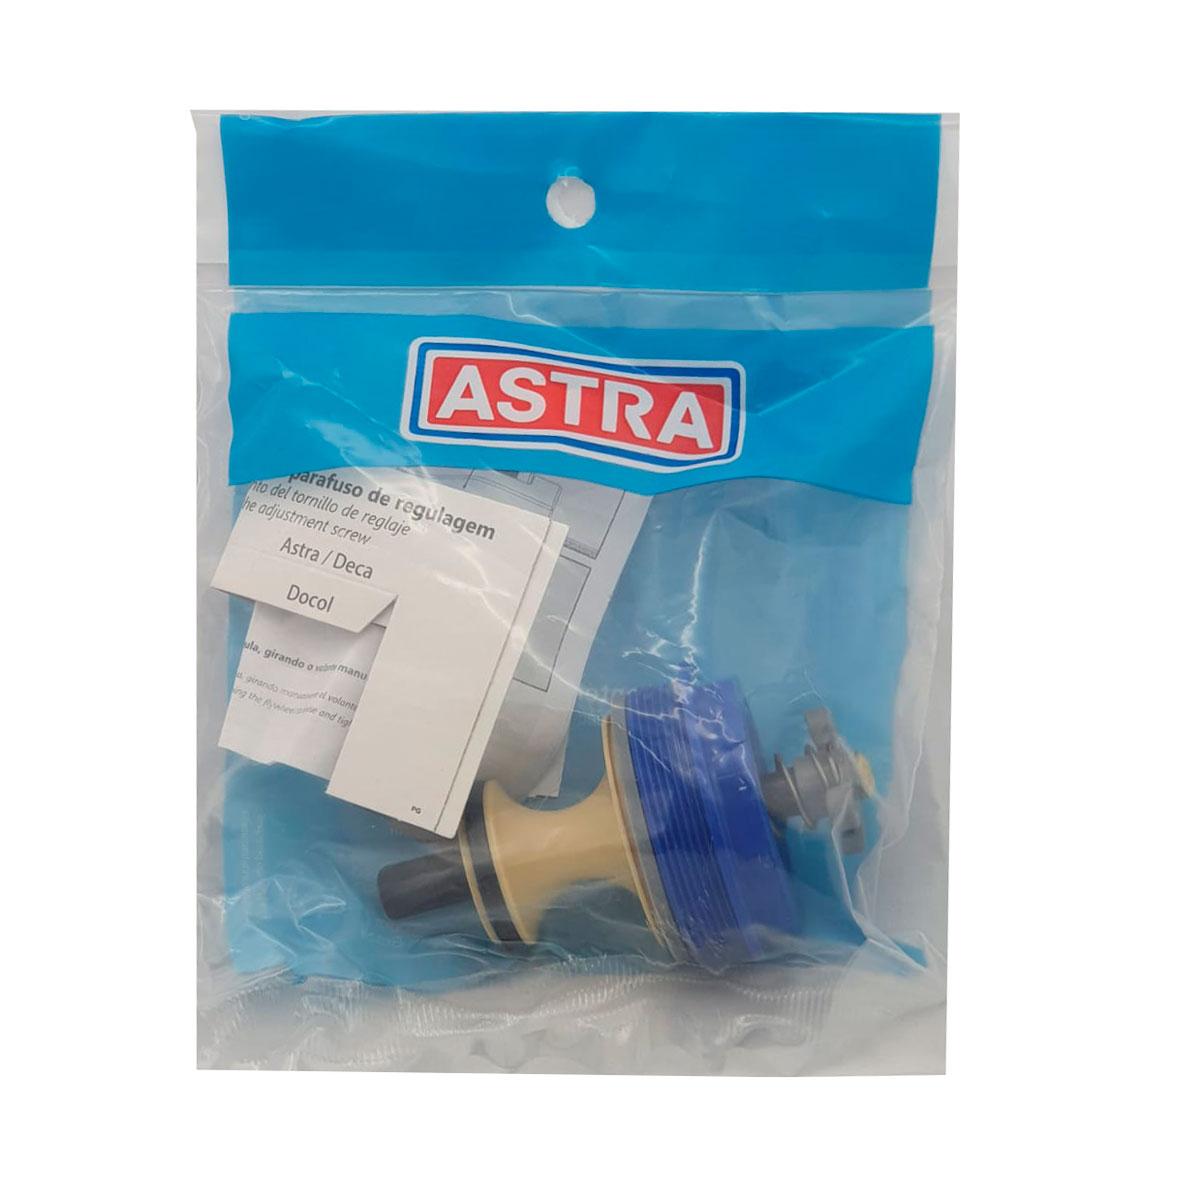 Reparo Válvula De Descarga Astra